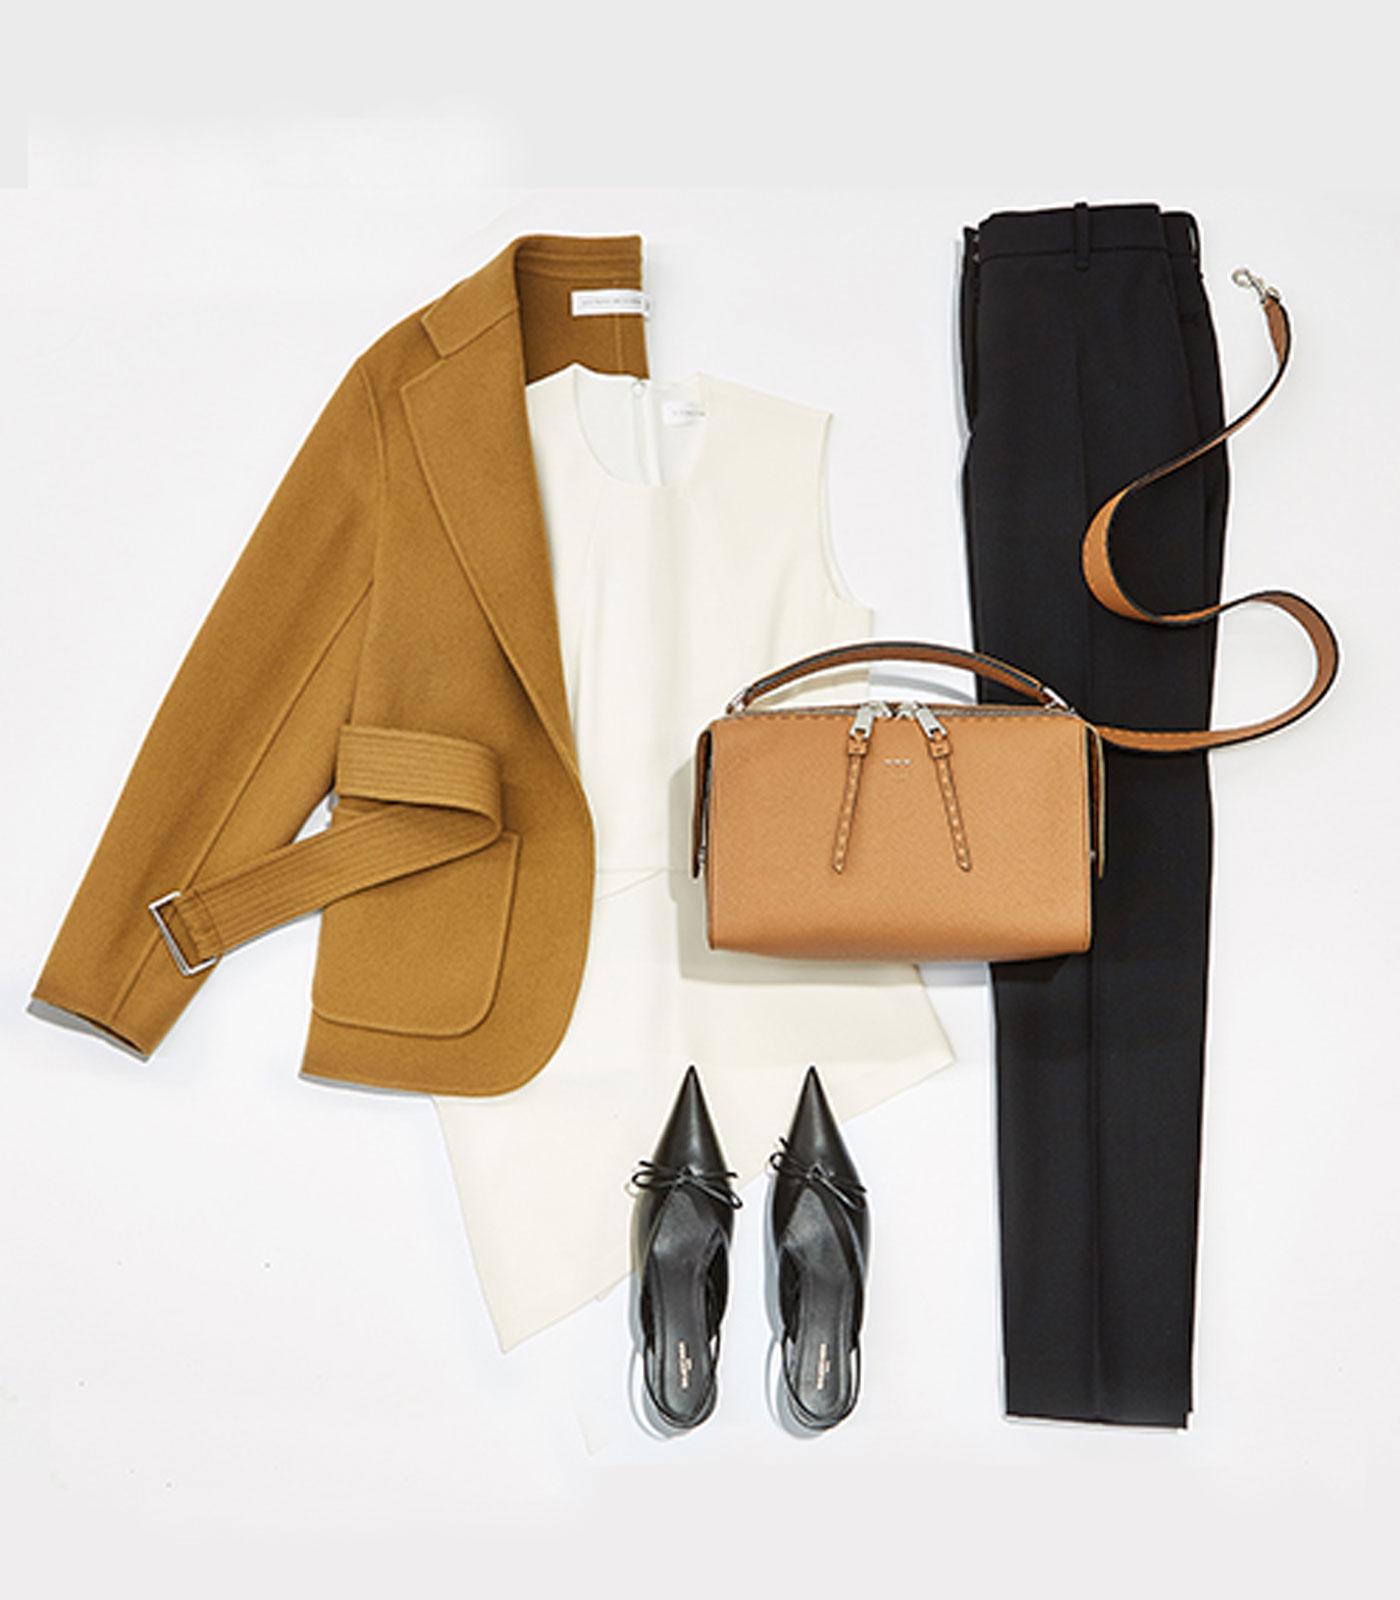 sharon warten personal fashion stylist consultant